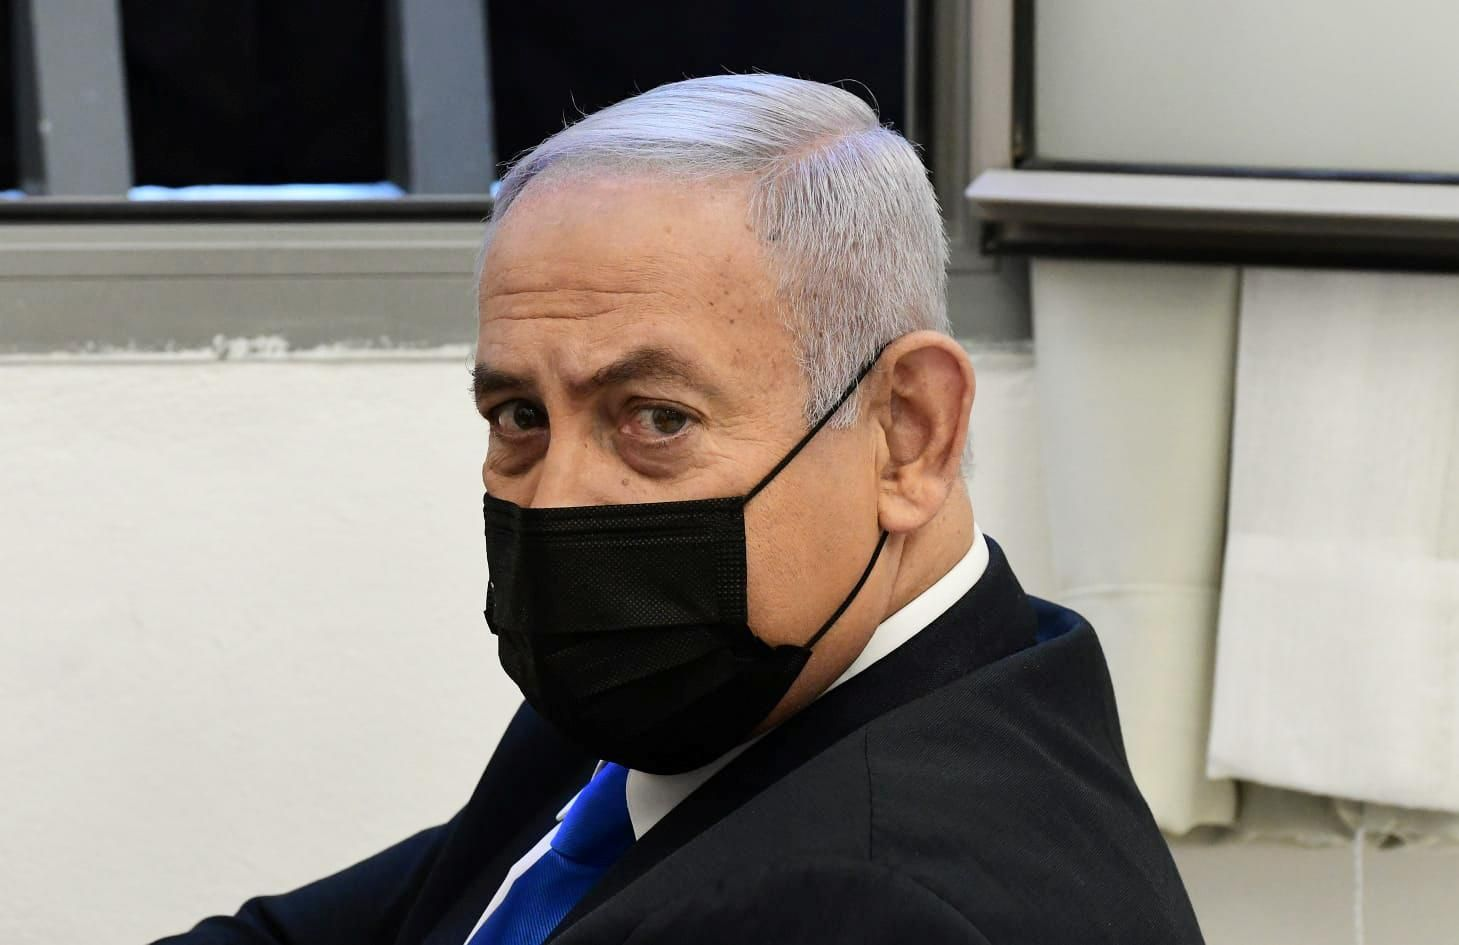 Israel's Prime Minister Benjamin Netanyahu in court